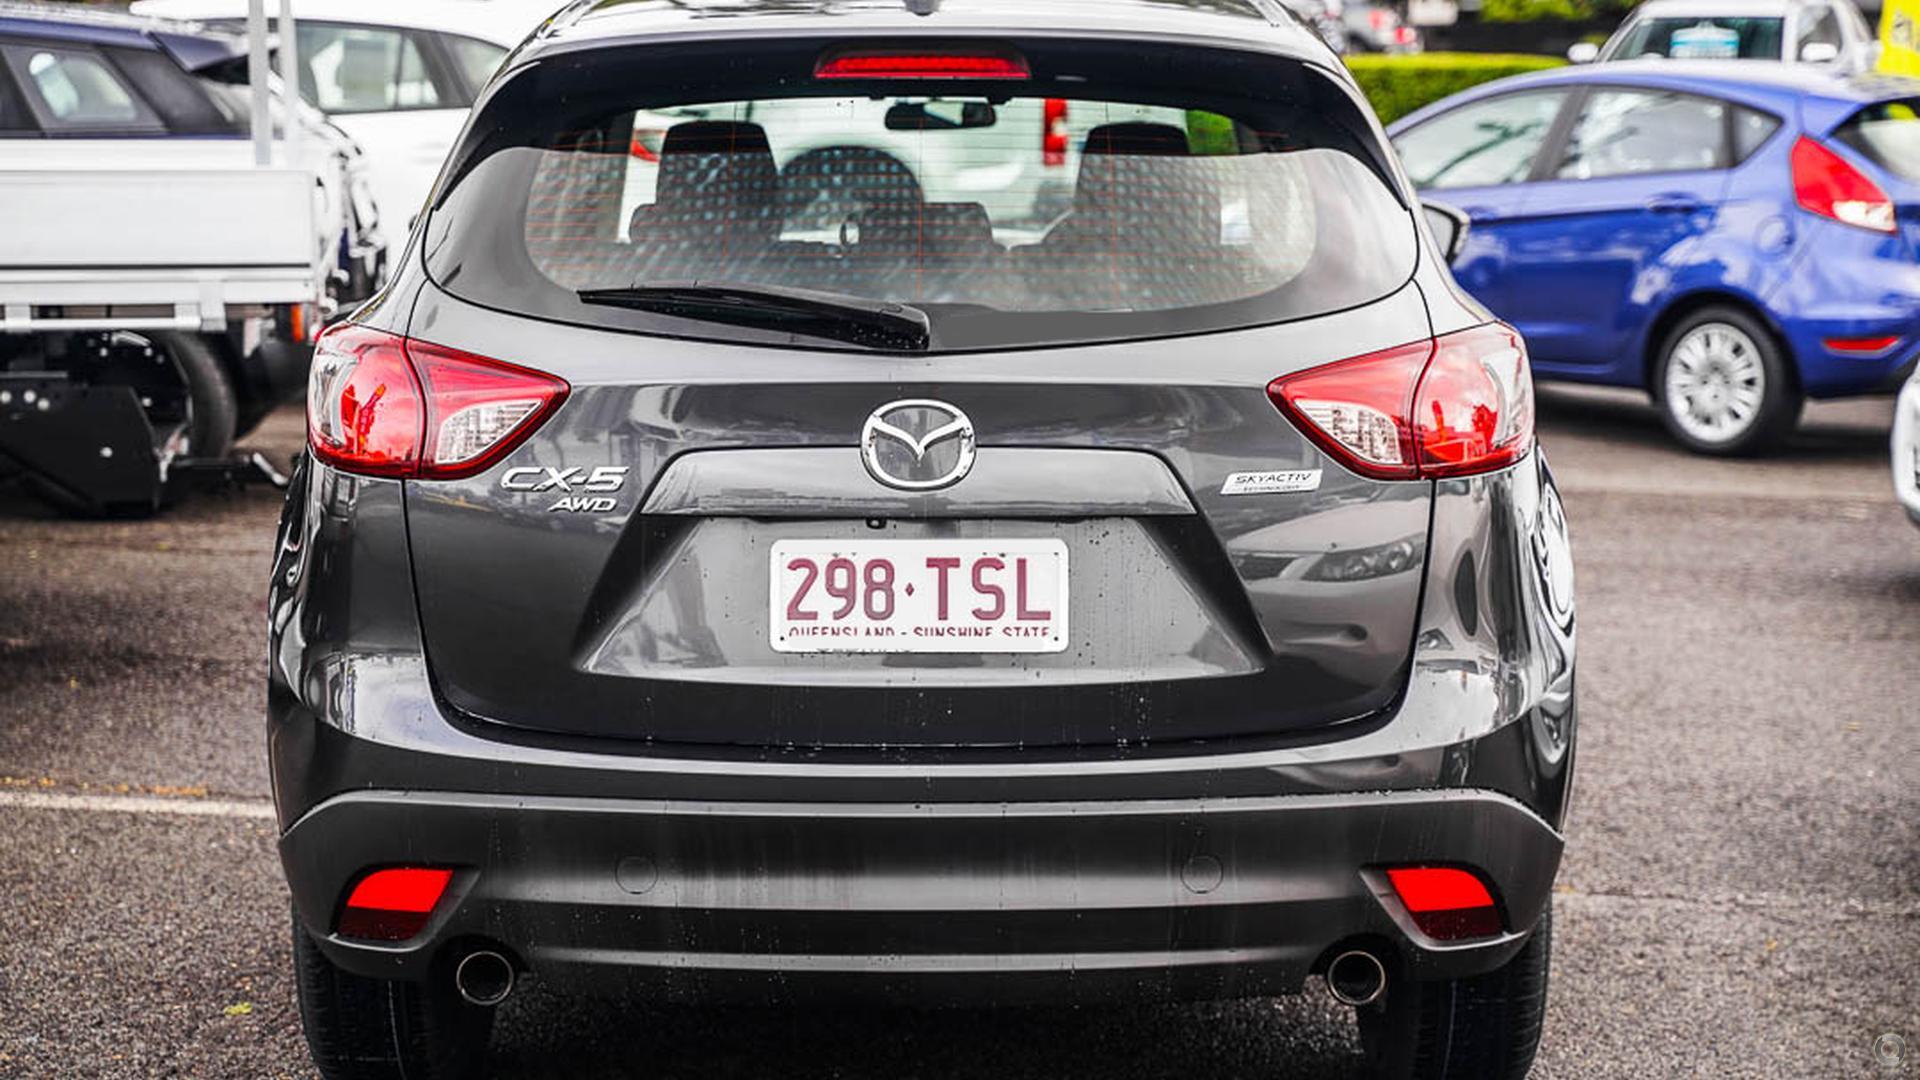 2013 Mazda Cx-5 Maxx Sport KE Series